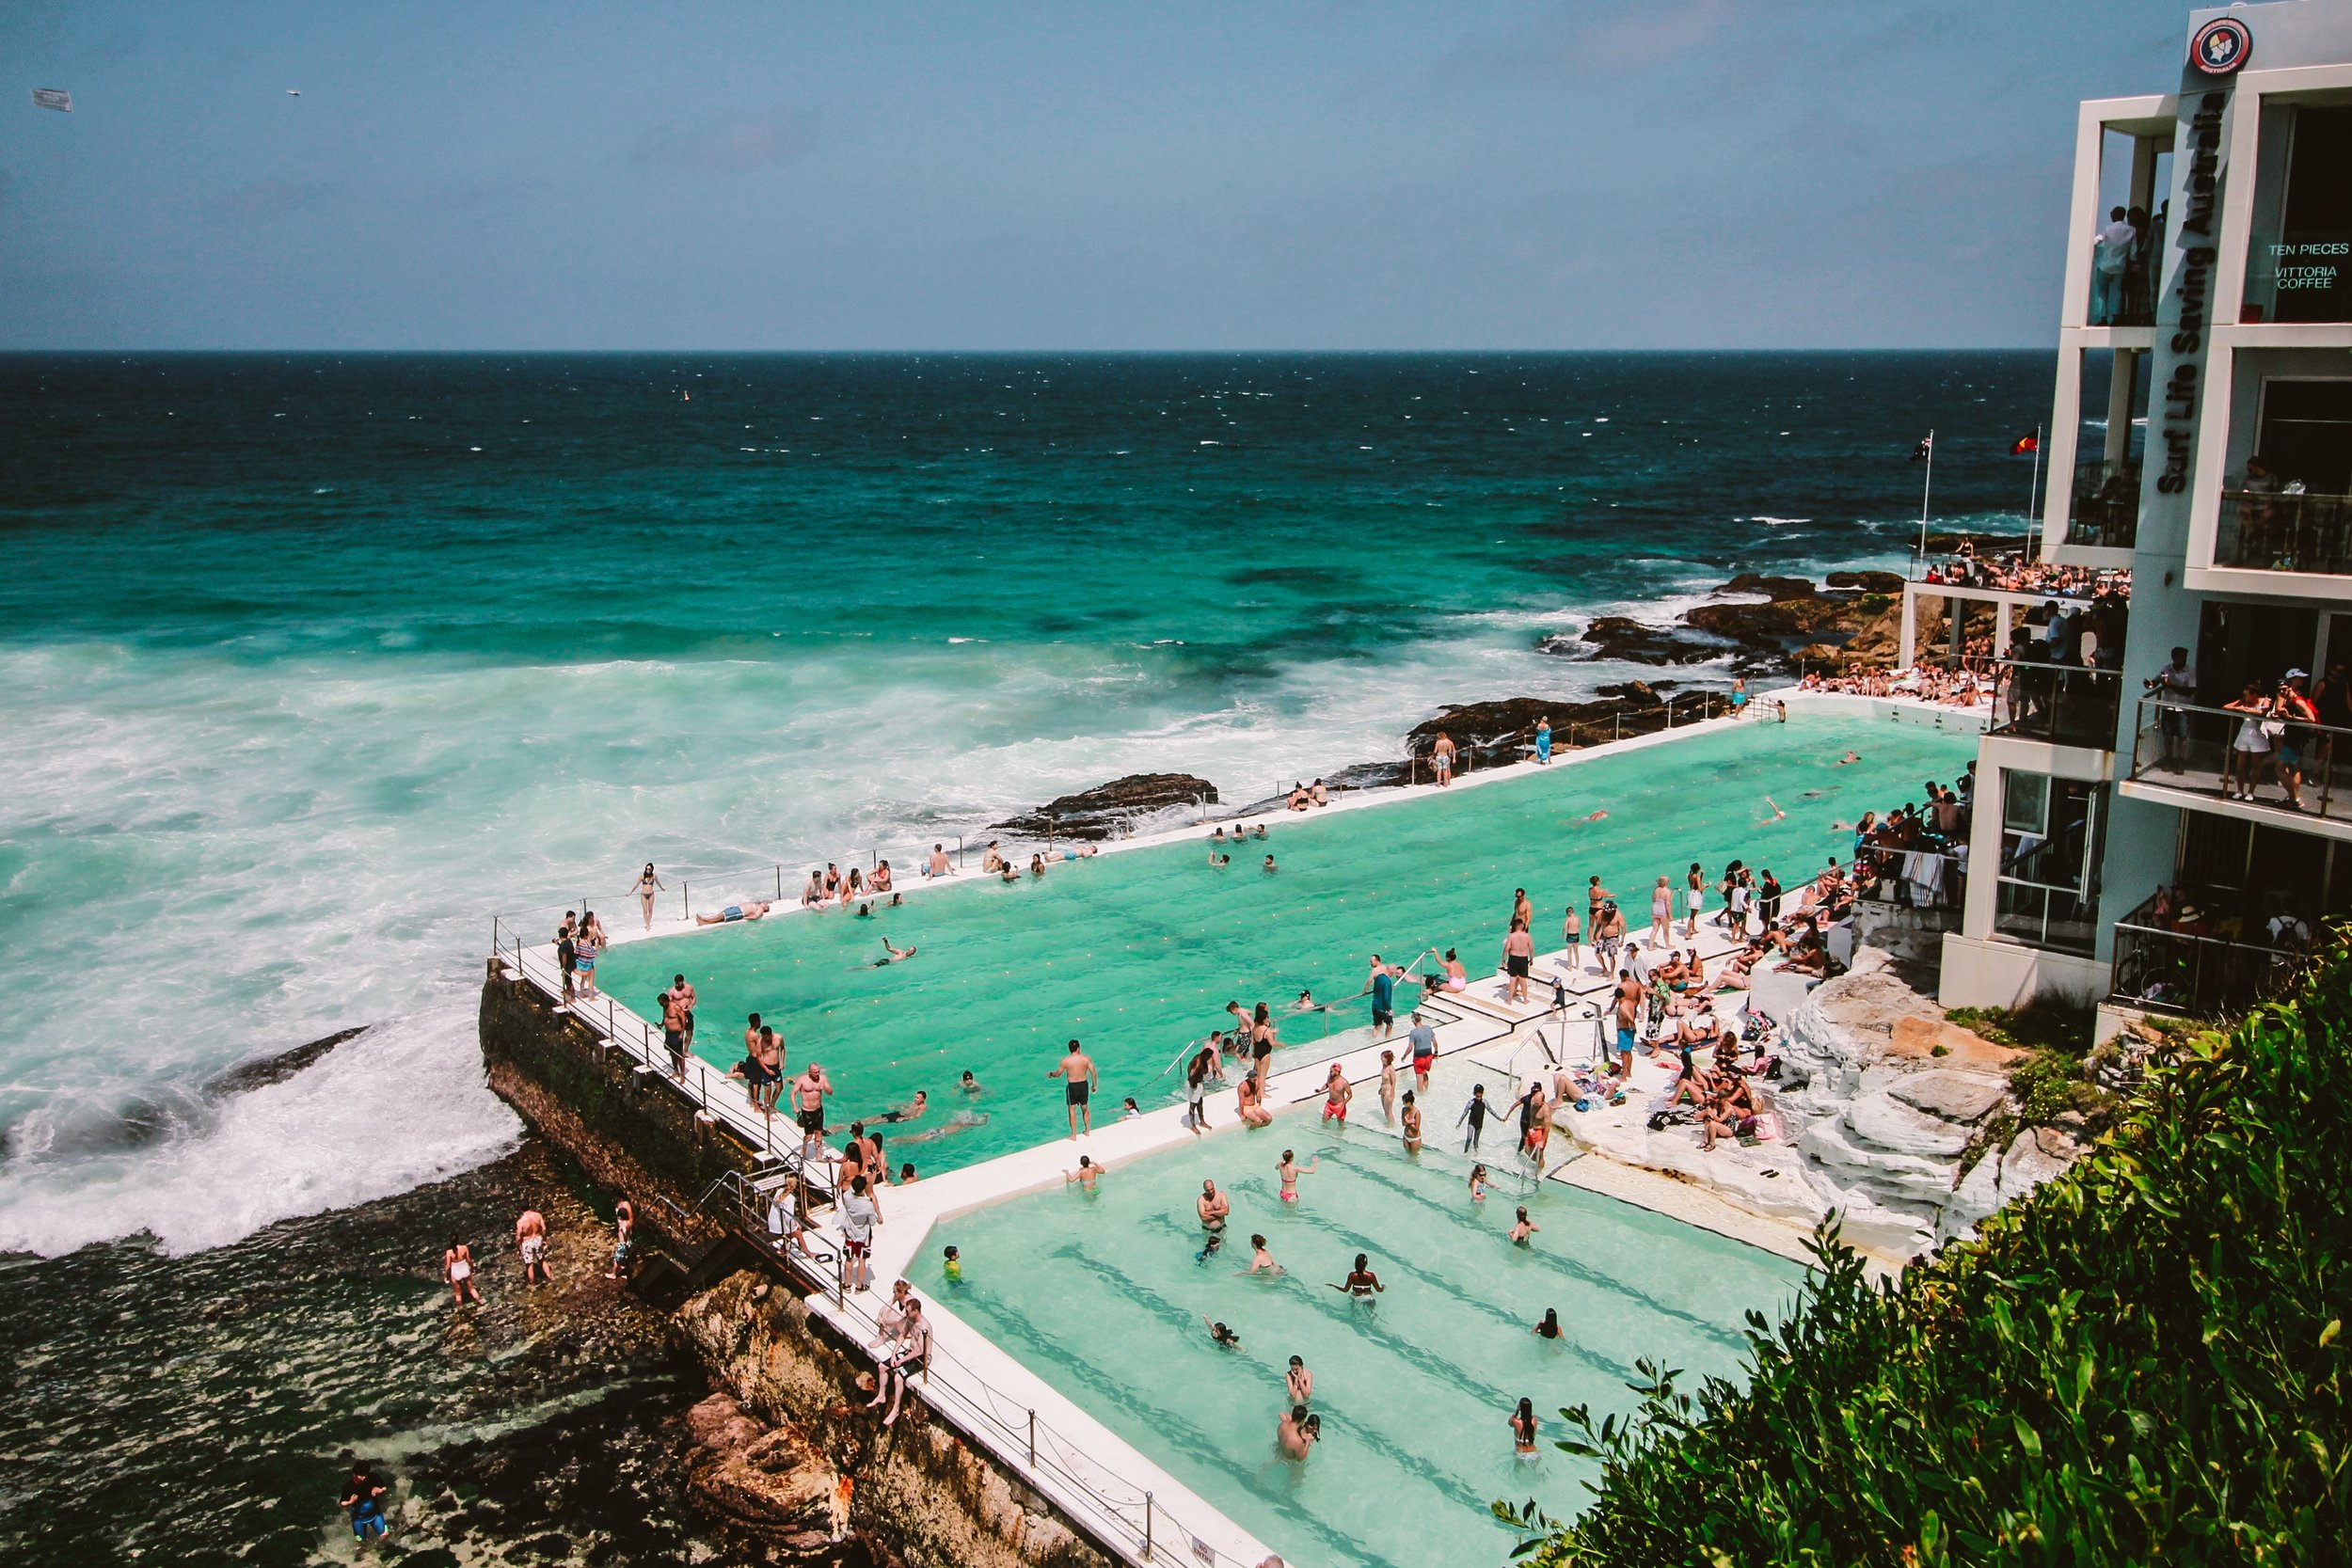 australia-beach-bondi-beach-785065.jpg